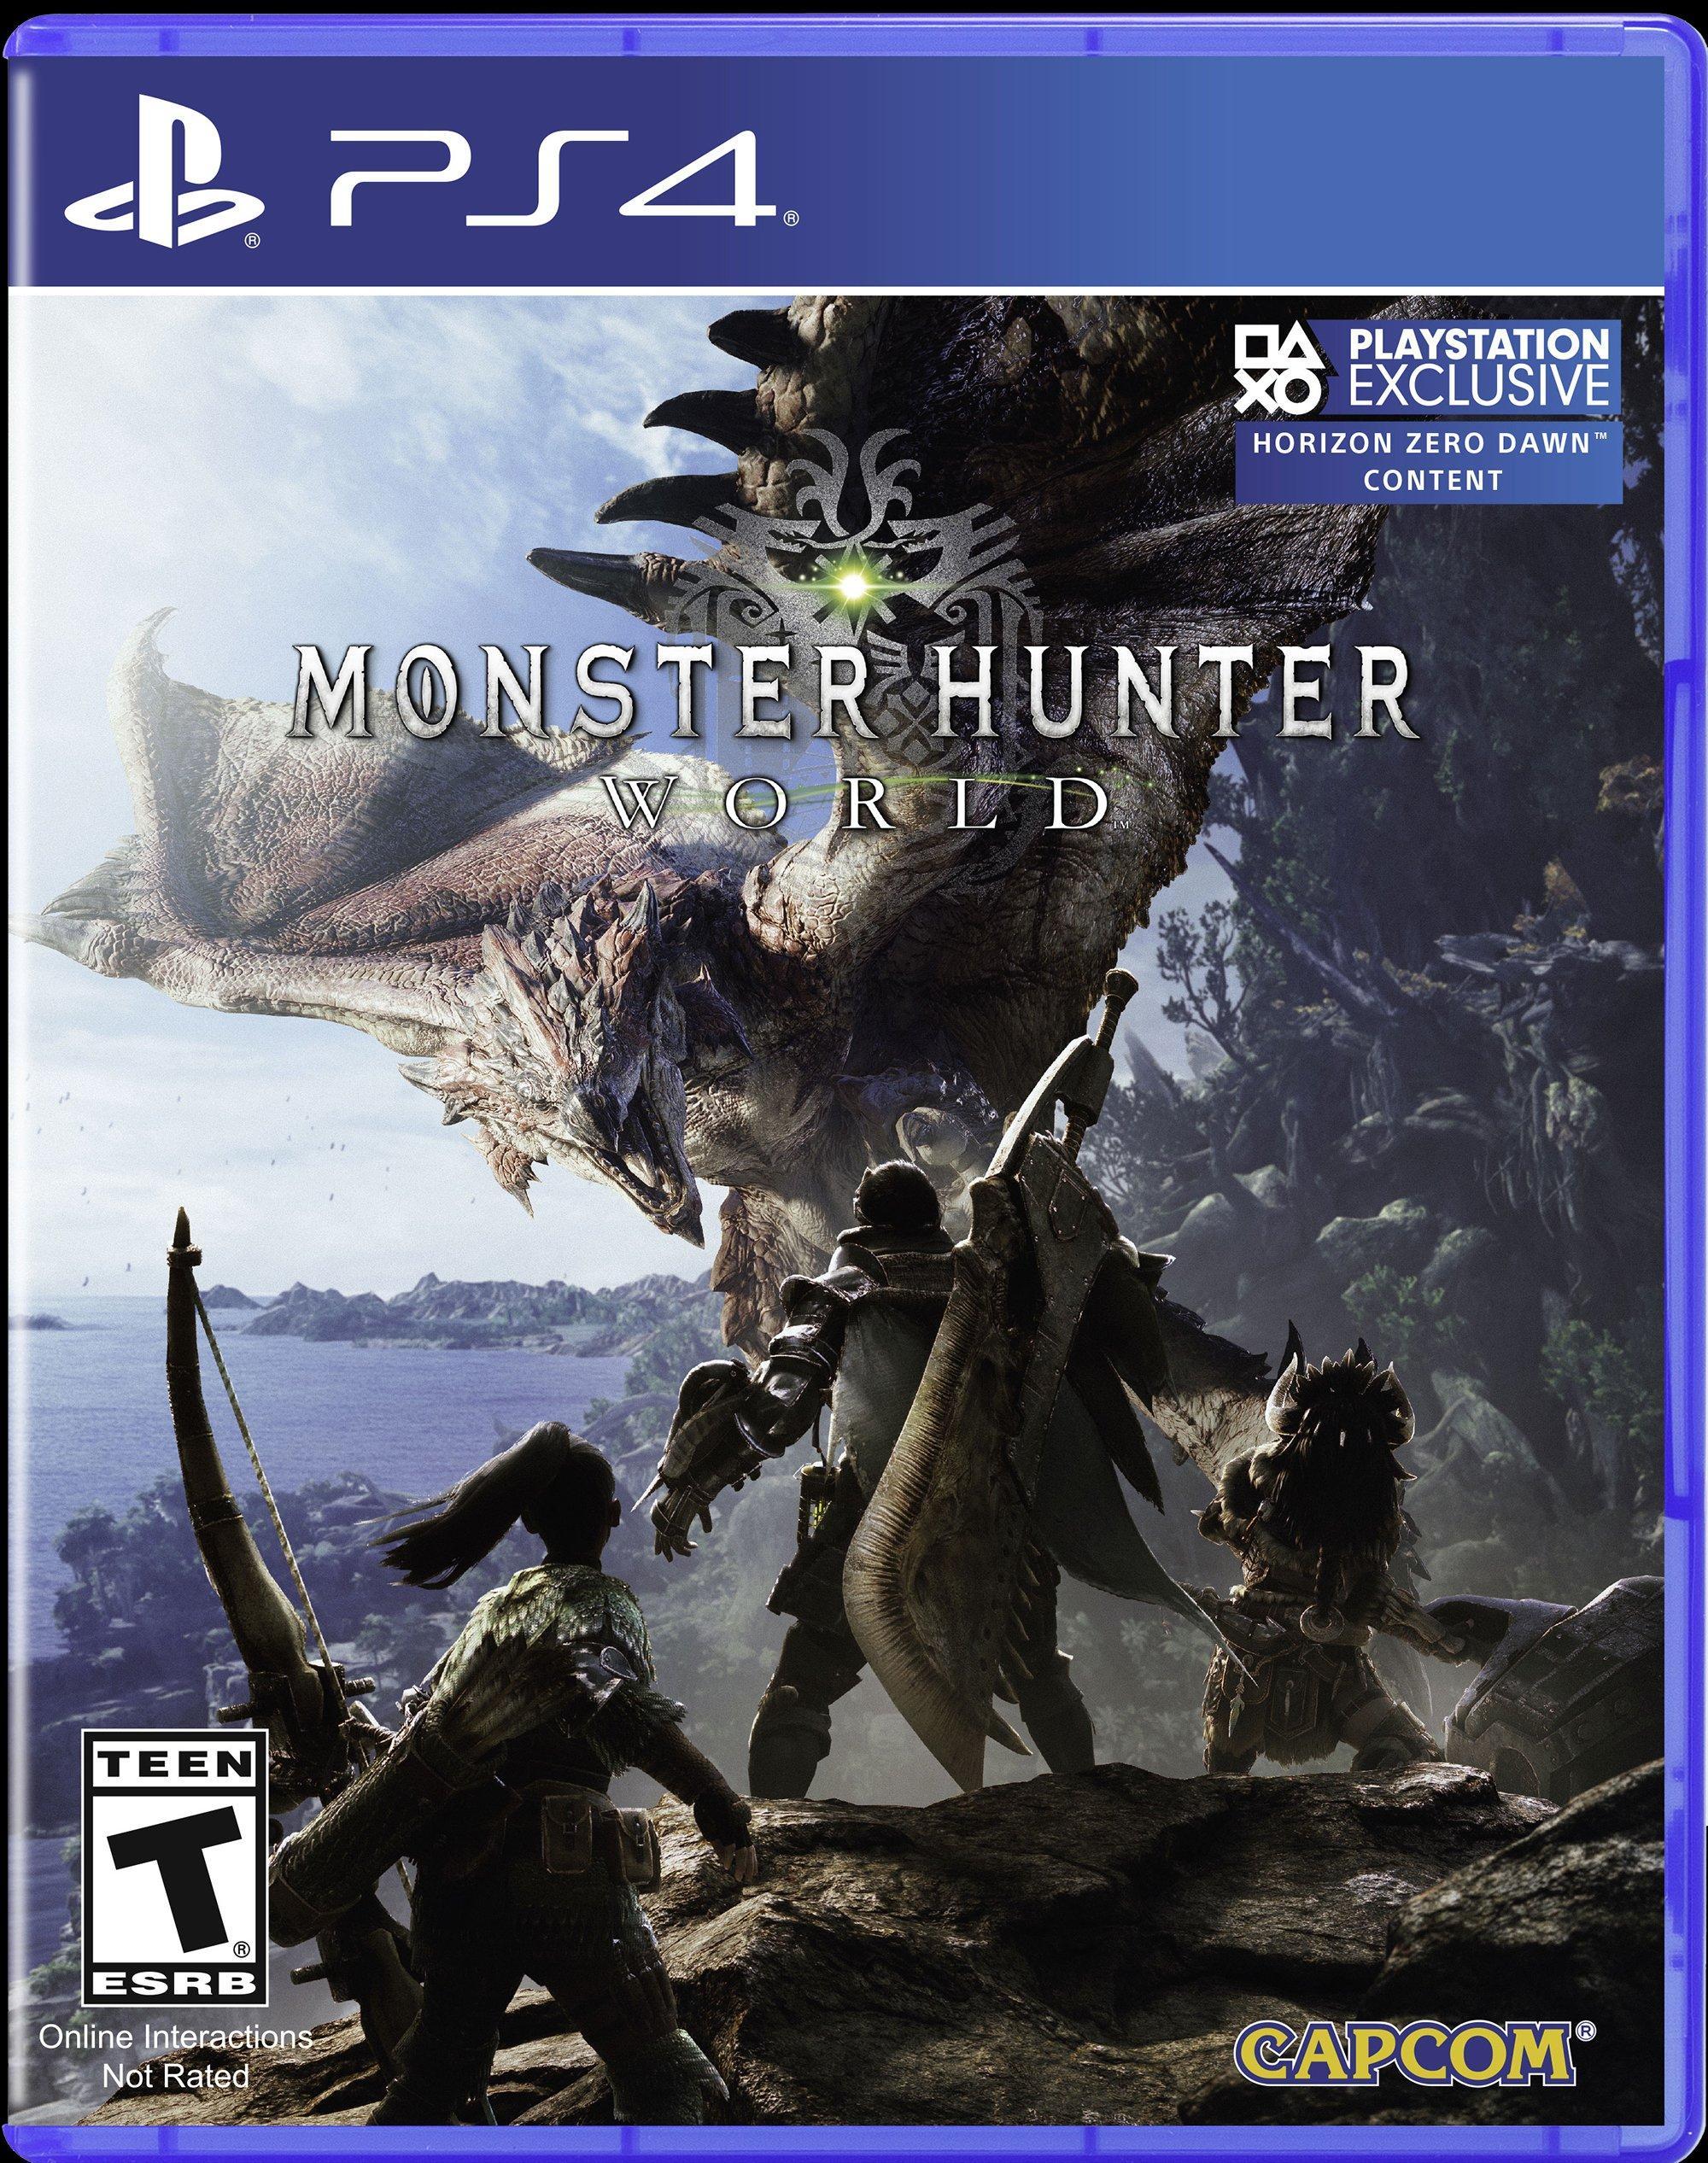 Monster Hunter: World | PlayStation 4 | Xbox One | GameStop $7.99